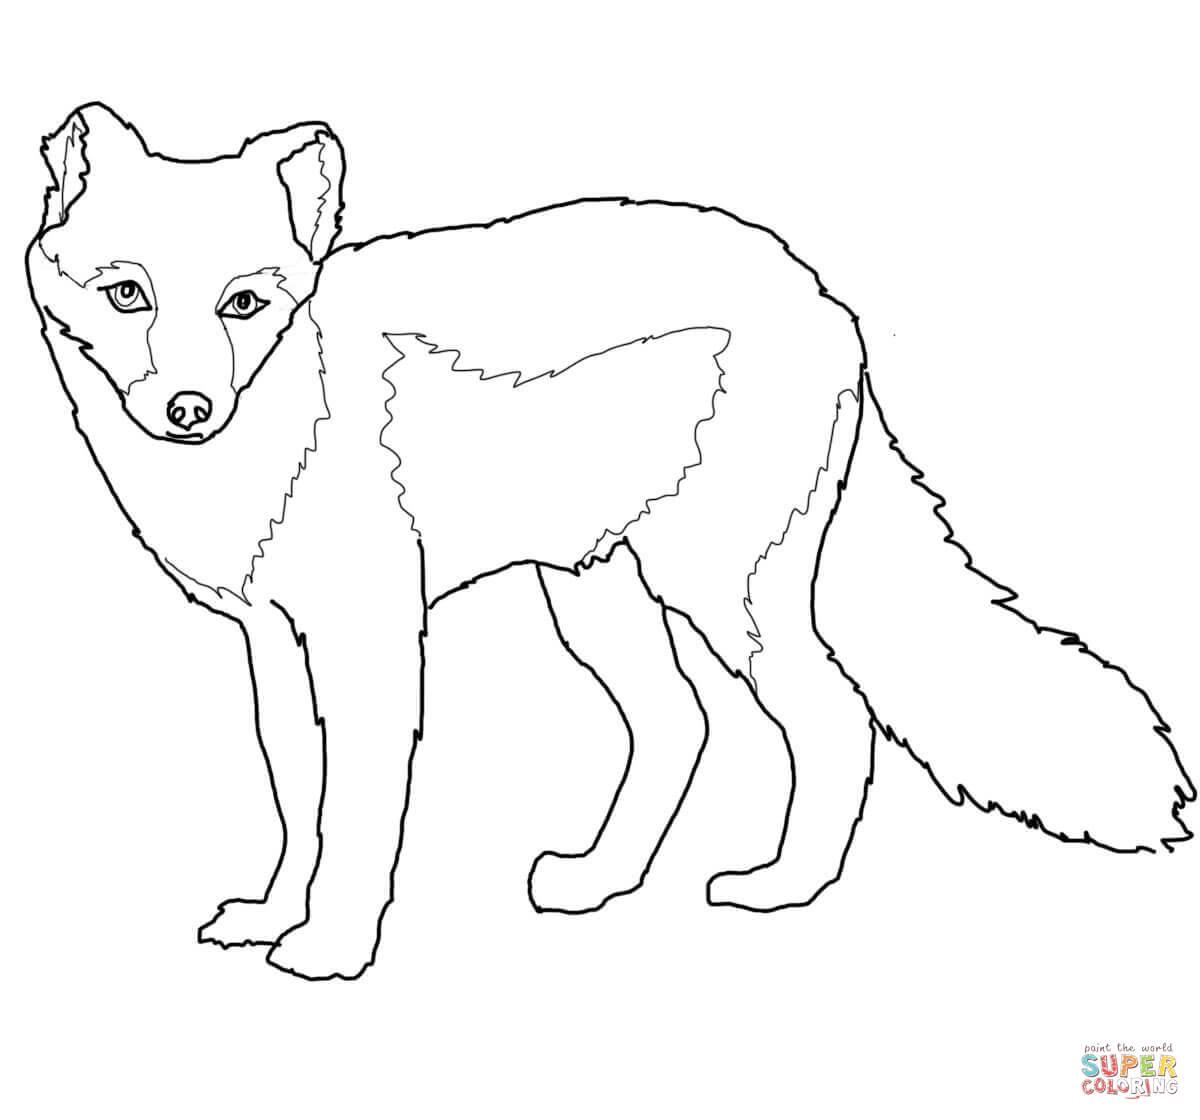 Arctic Fox Summer Coat Coloring Page